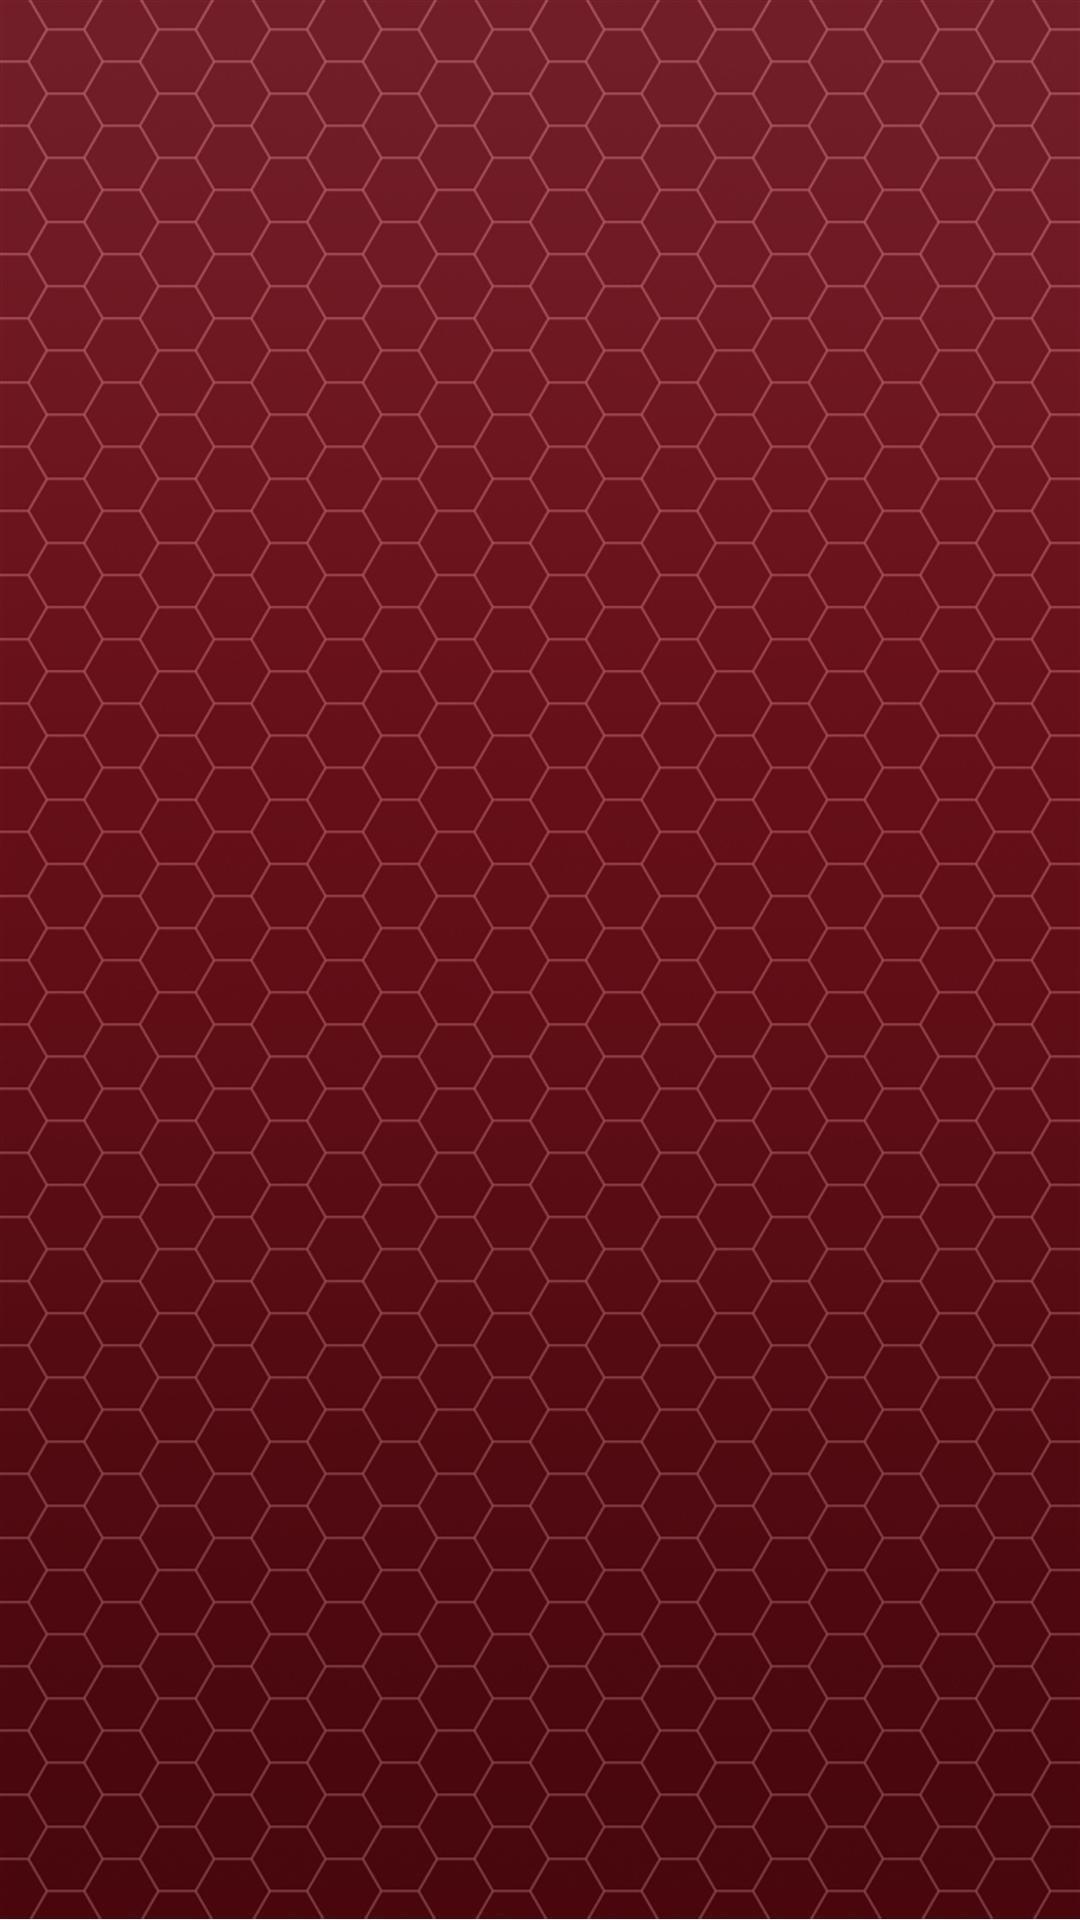 Textured Red Wallpaper Wallpapertag